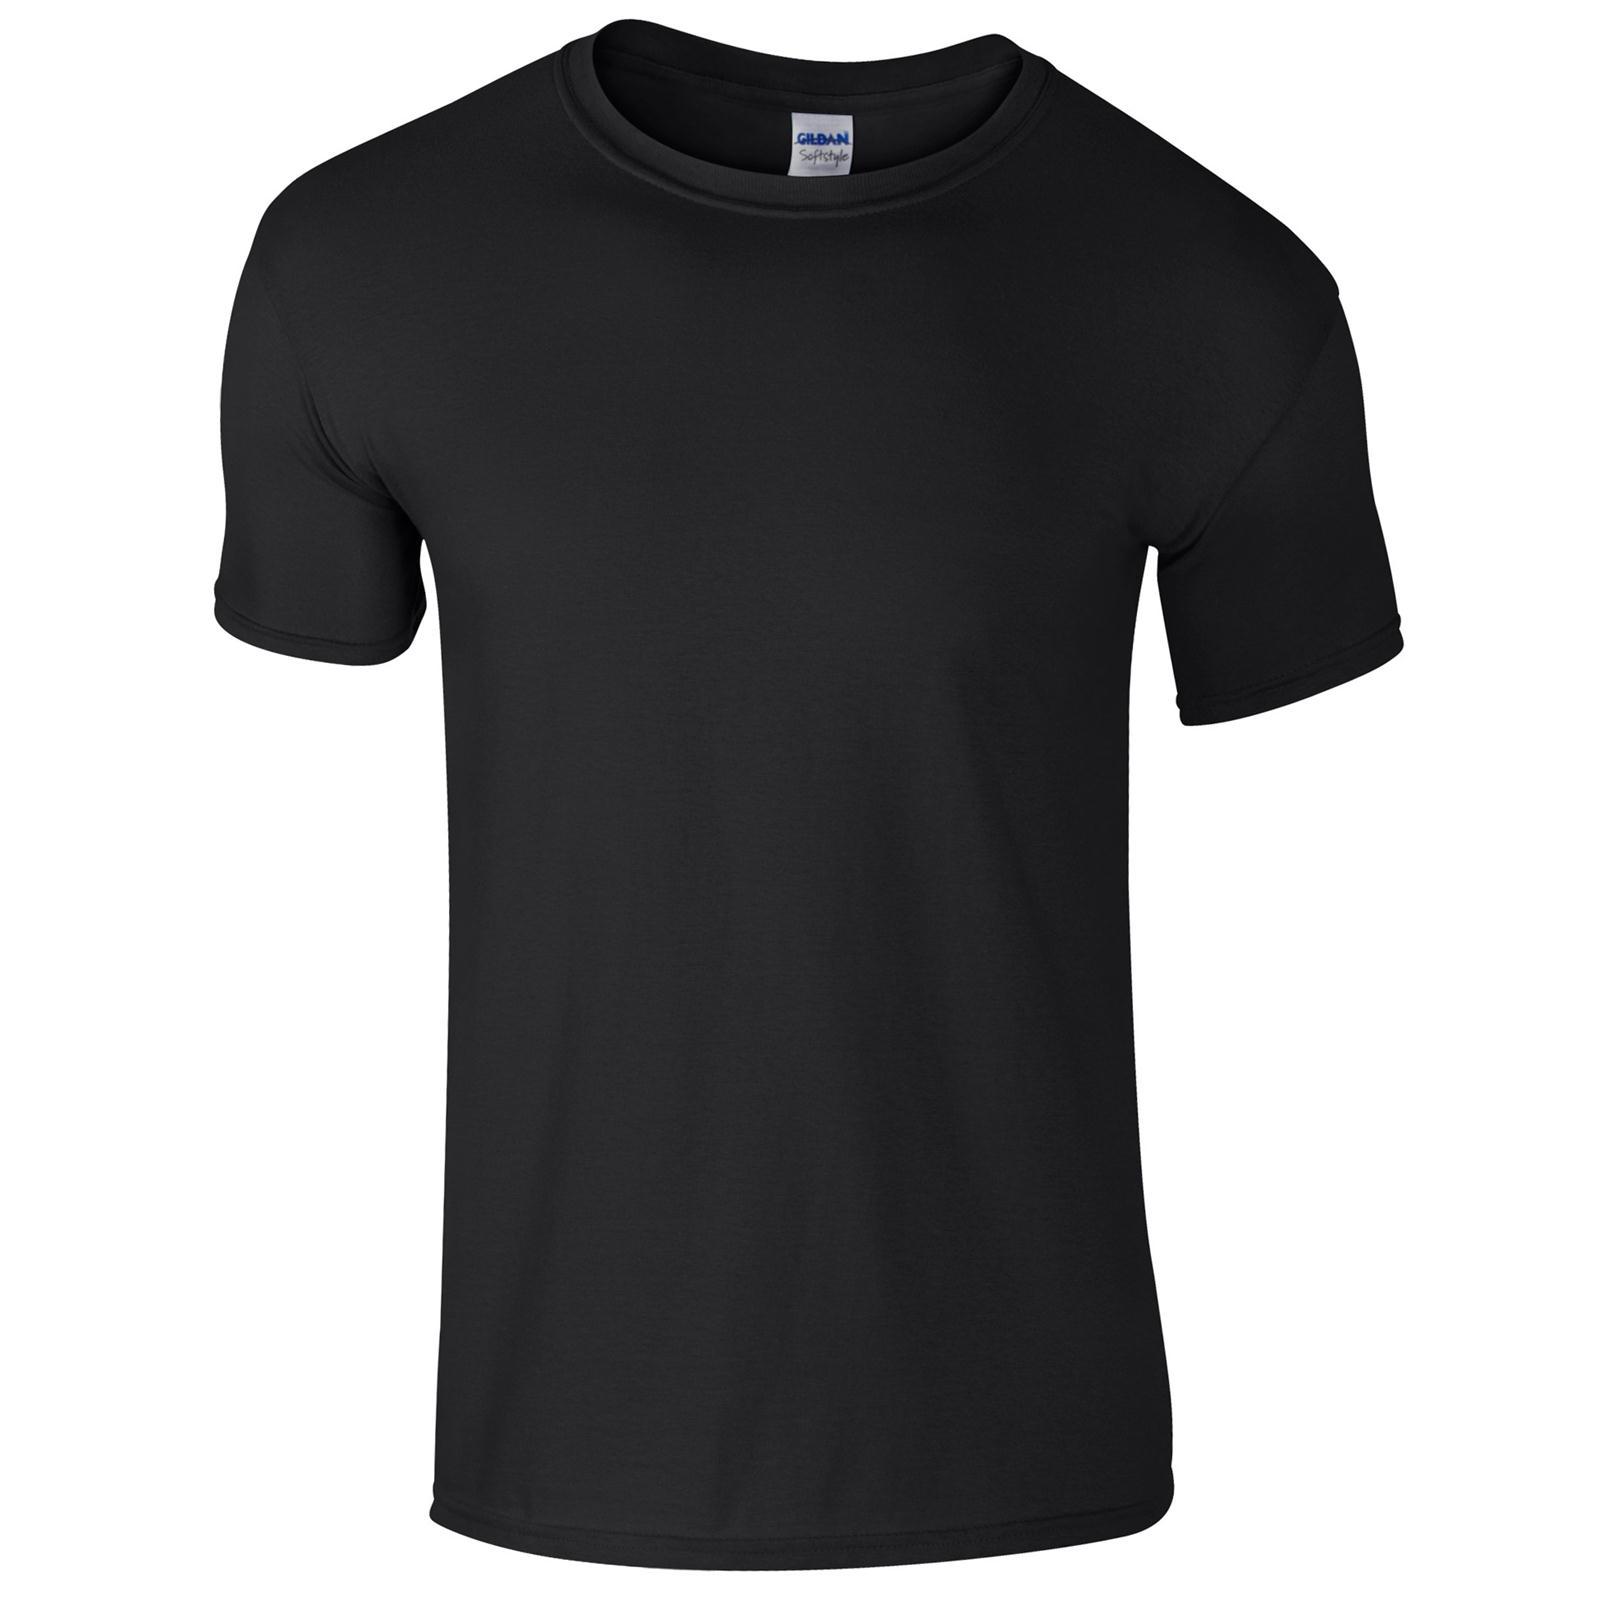 Black t shirt unisex - New Gildan Unisex Adults Soft Style Cotton Crew